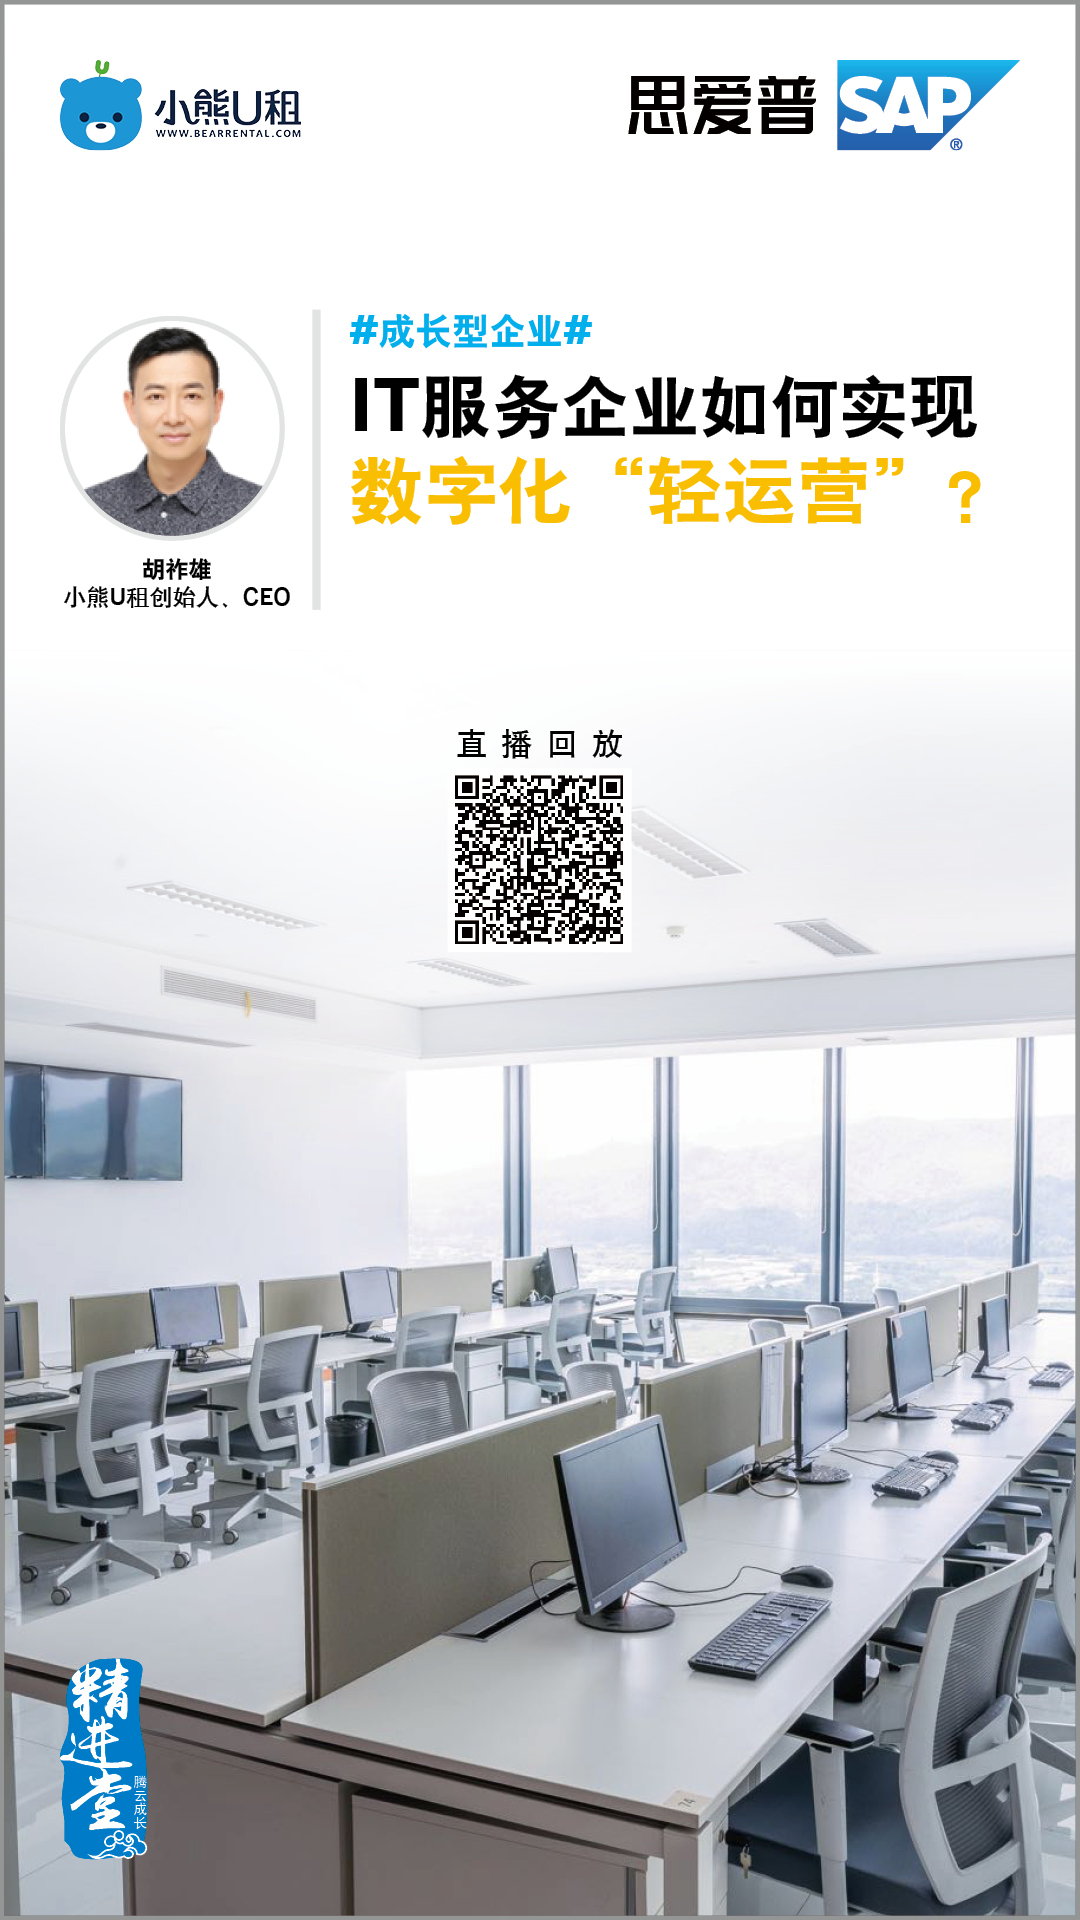 IT服务数字化轻运营.jpg